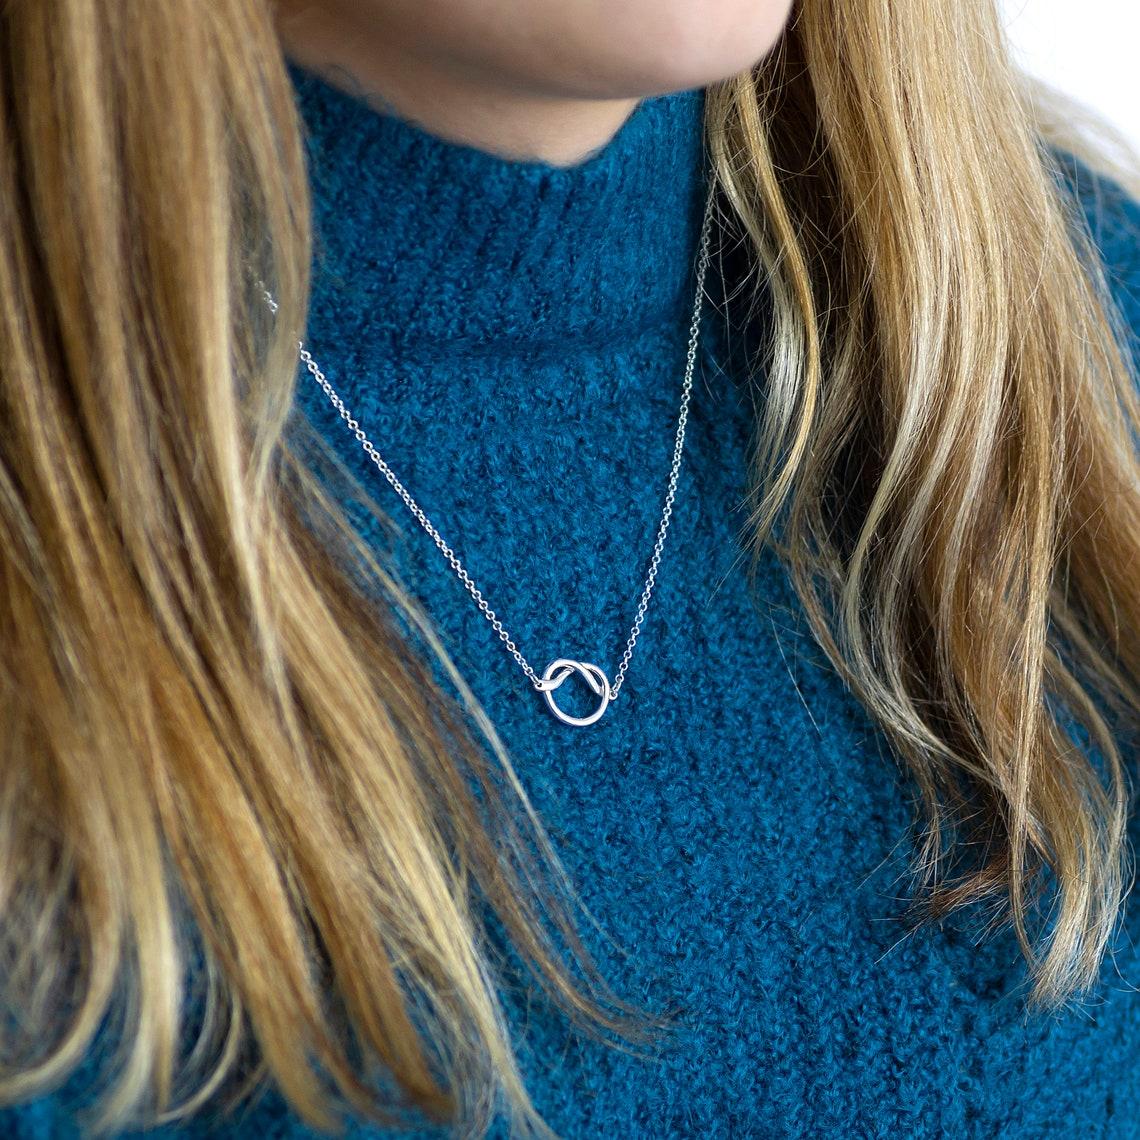 Friendship knot necklace